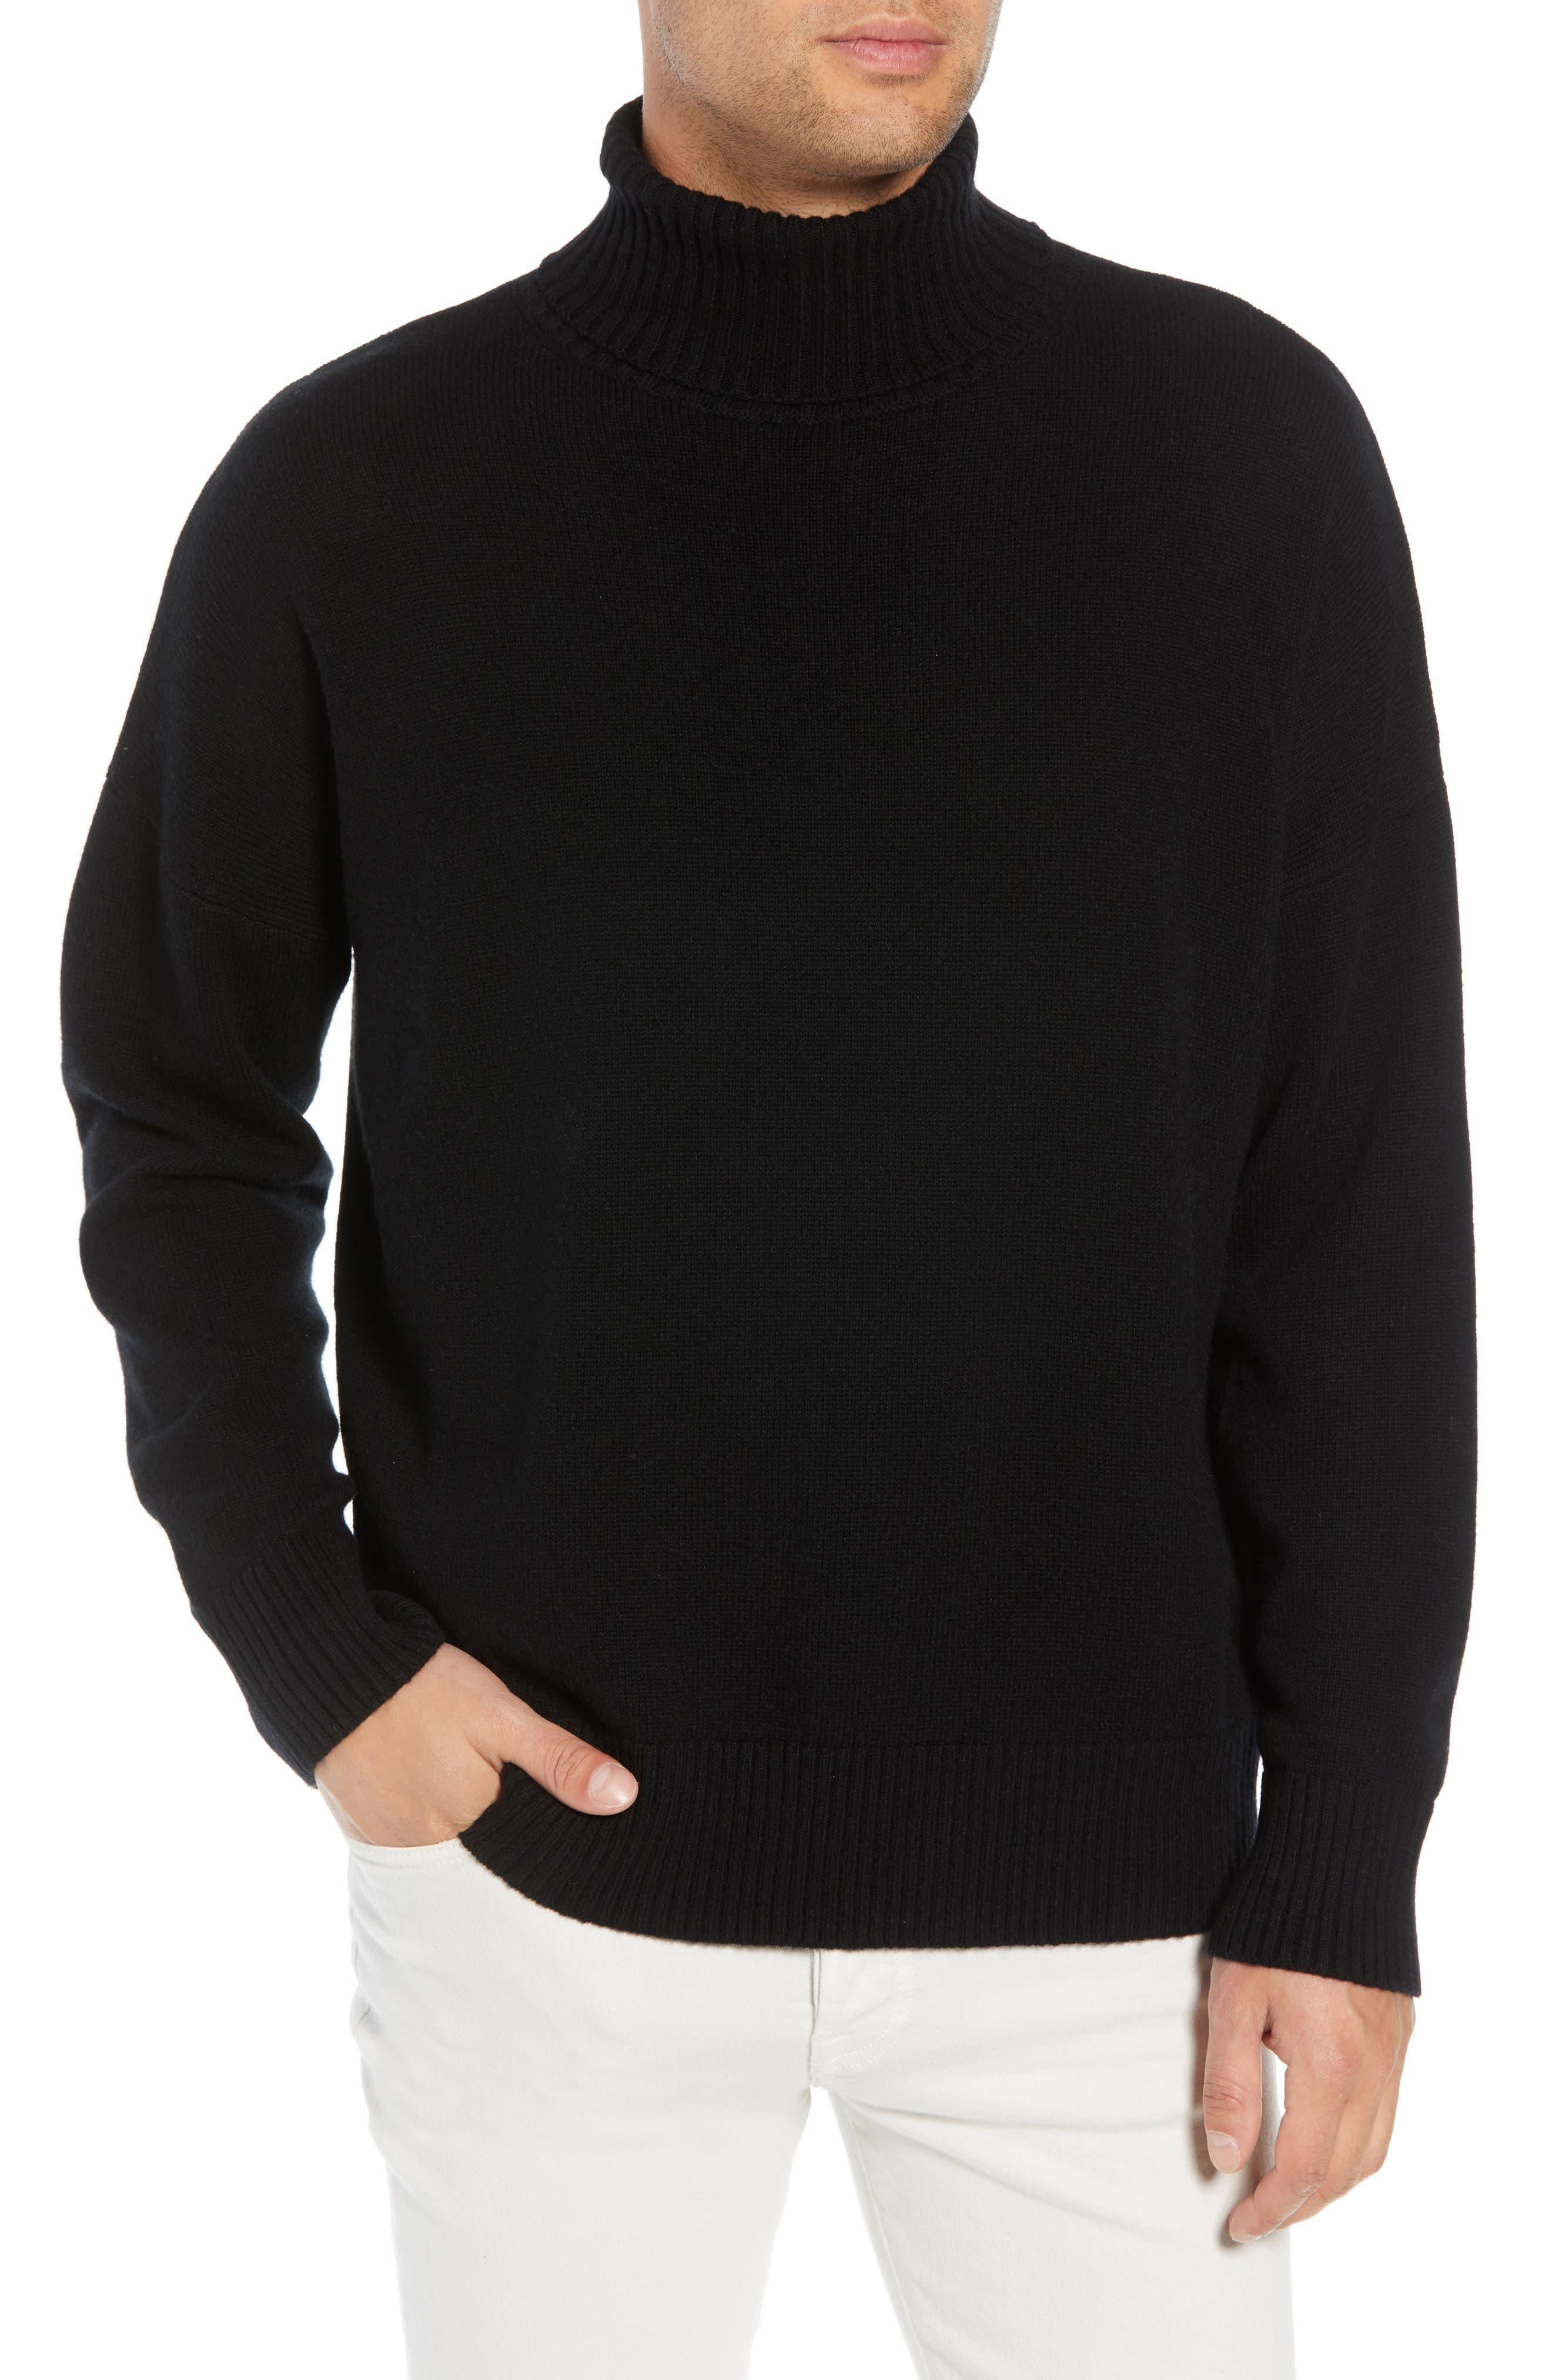 Wool & Cashmere Turtleneck Sweater,                             Main thumbnail 1, color,                             BLACK